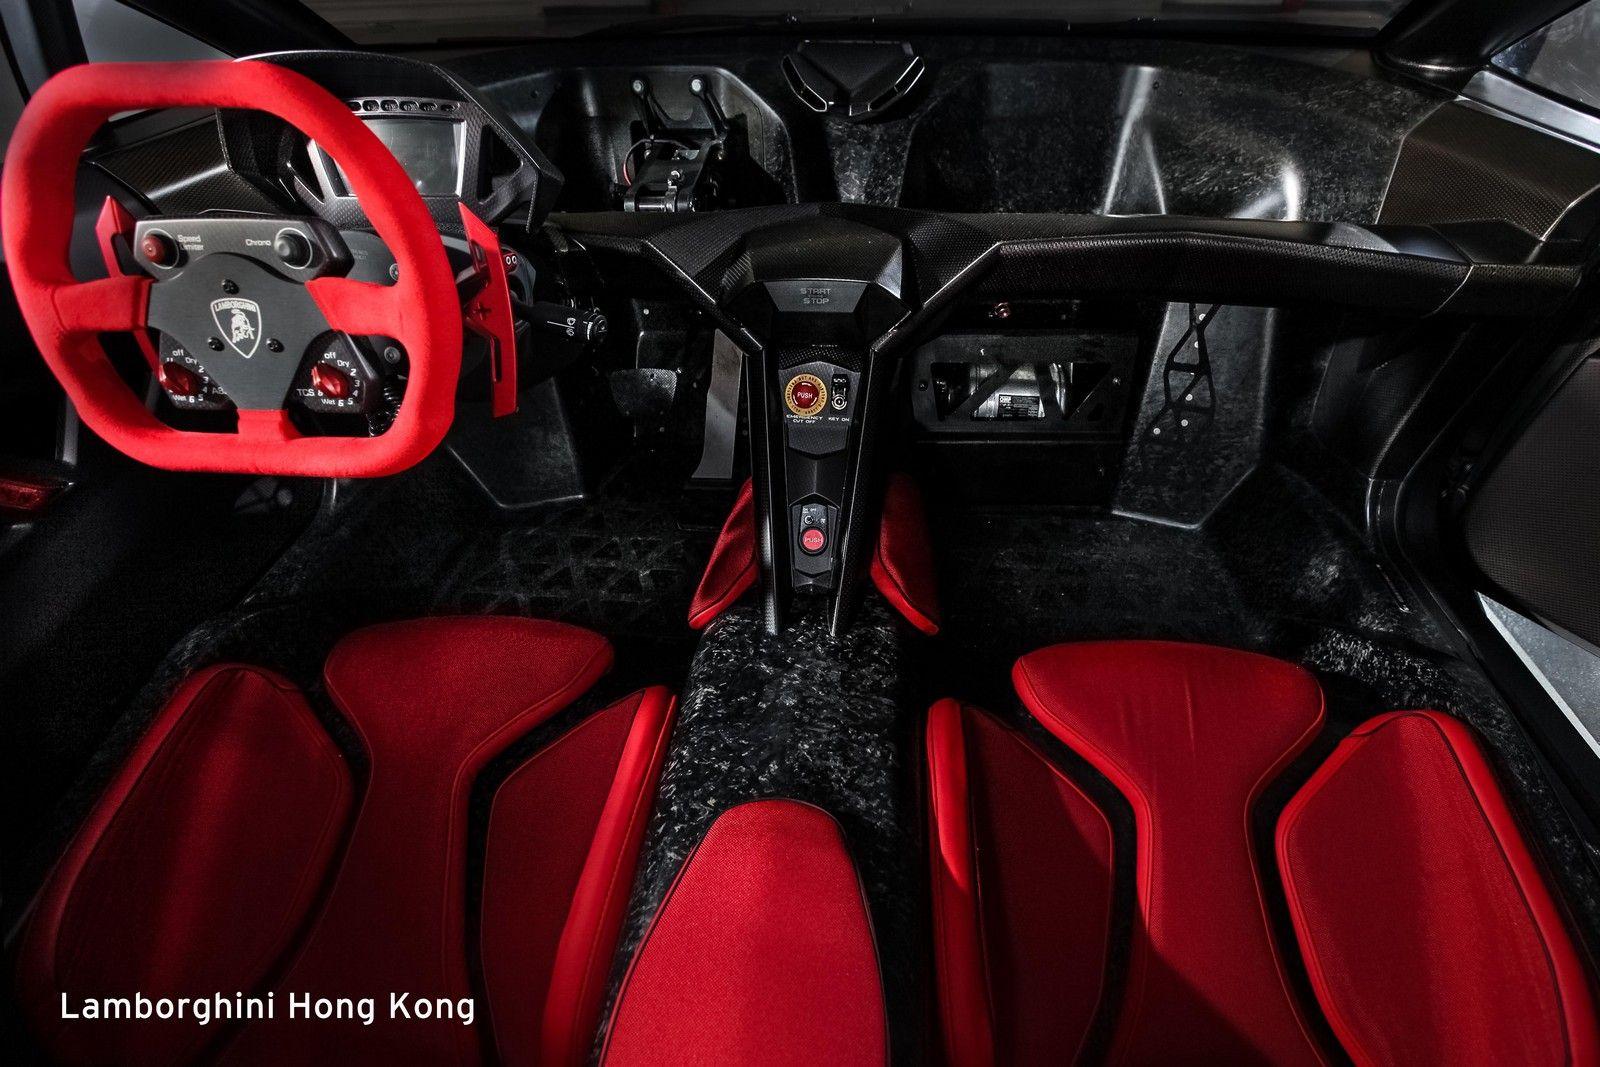 Lamborghini Sesto Elemento With Images Lamborghini Sesto